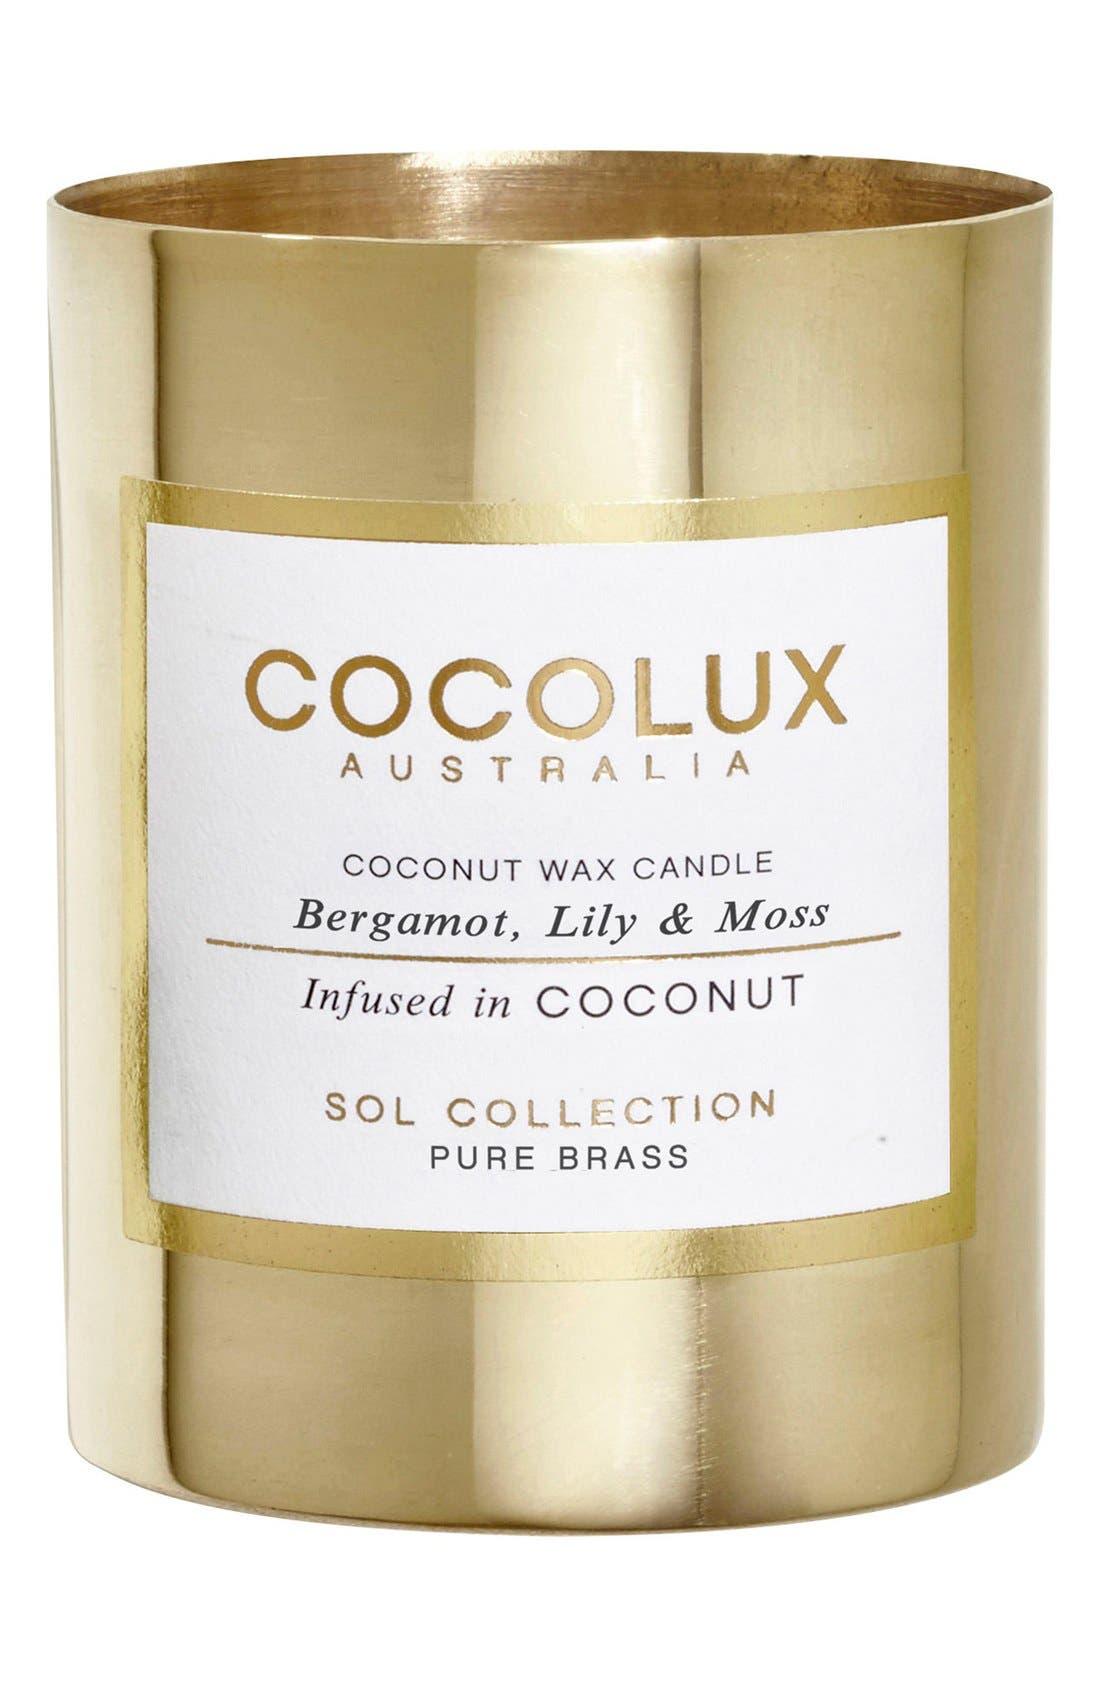 Cocolux Australia Bergamot, Lily & Moss Small Brass Candle